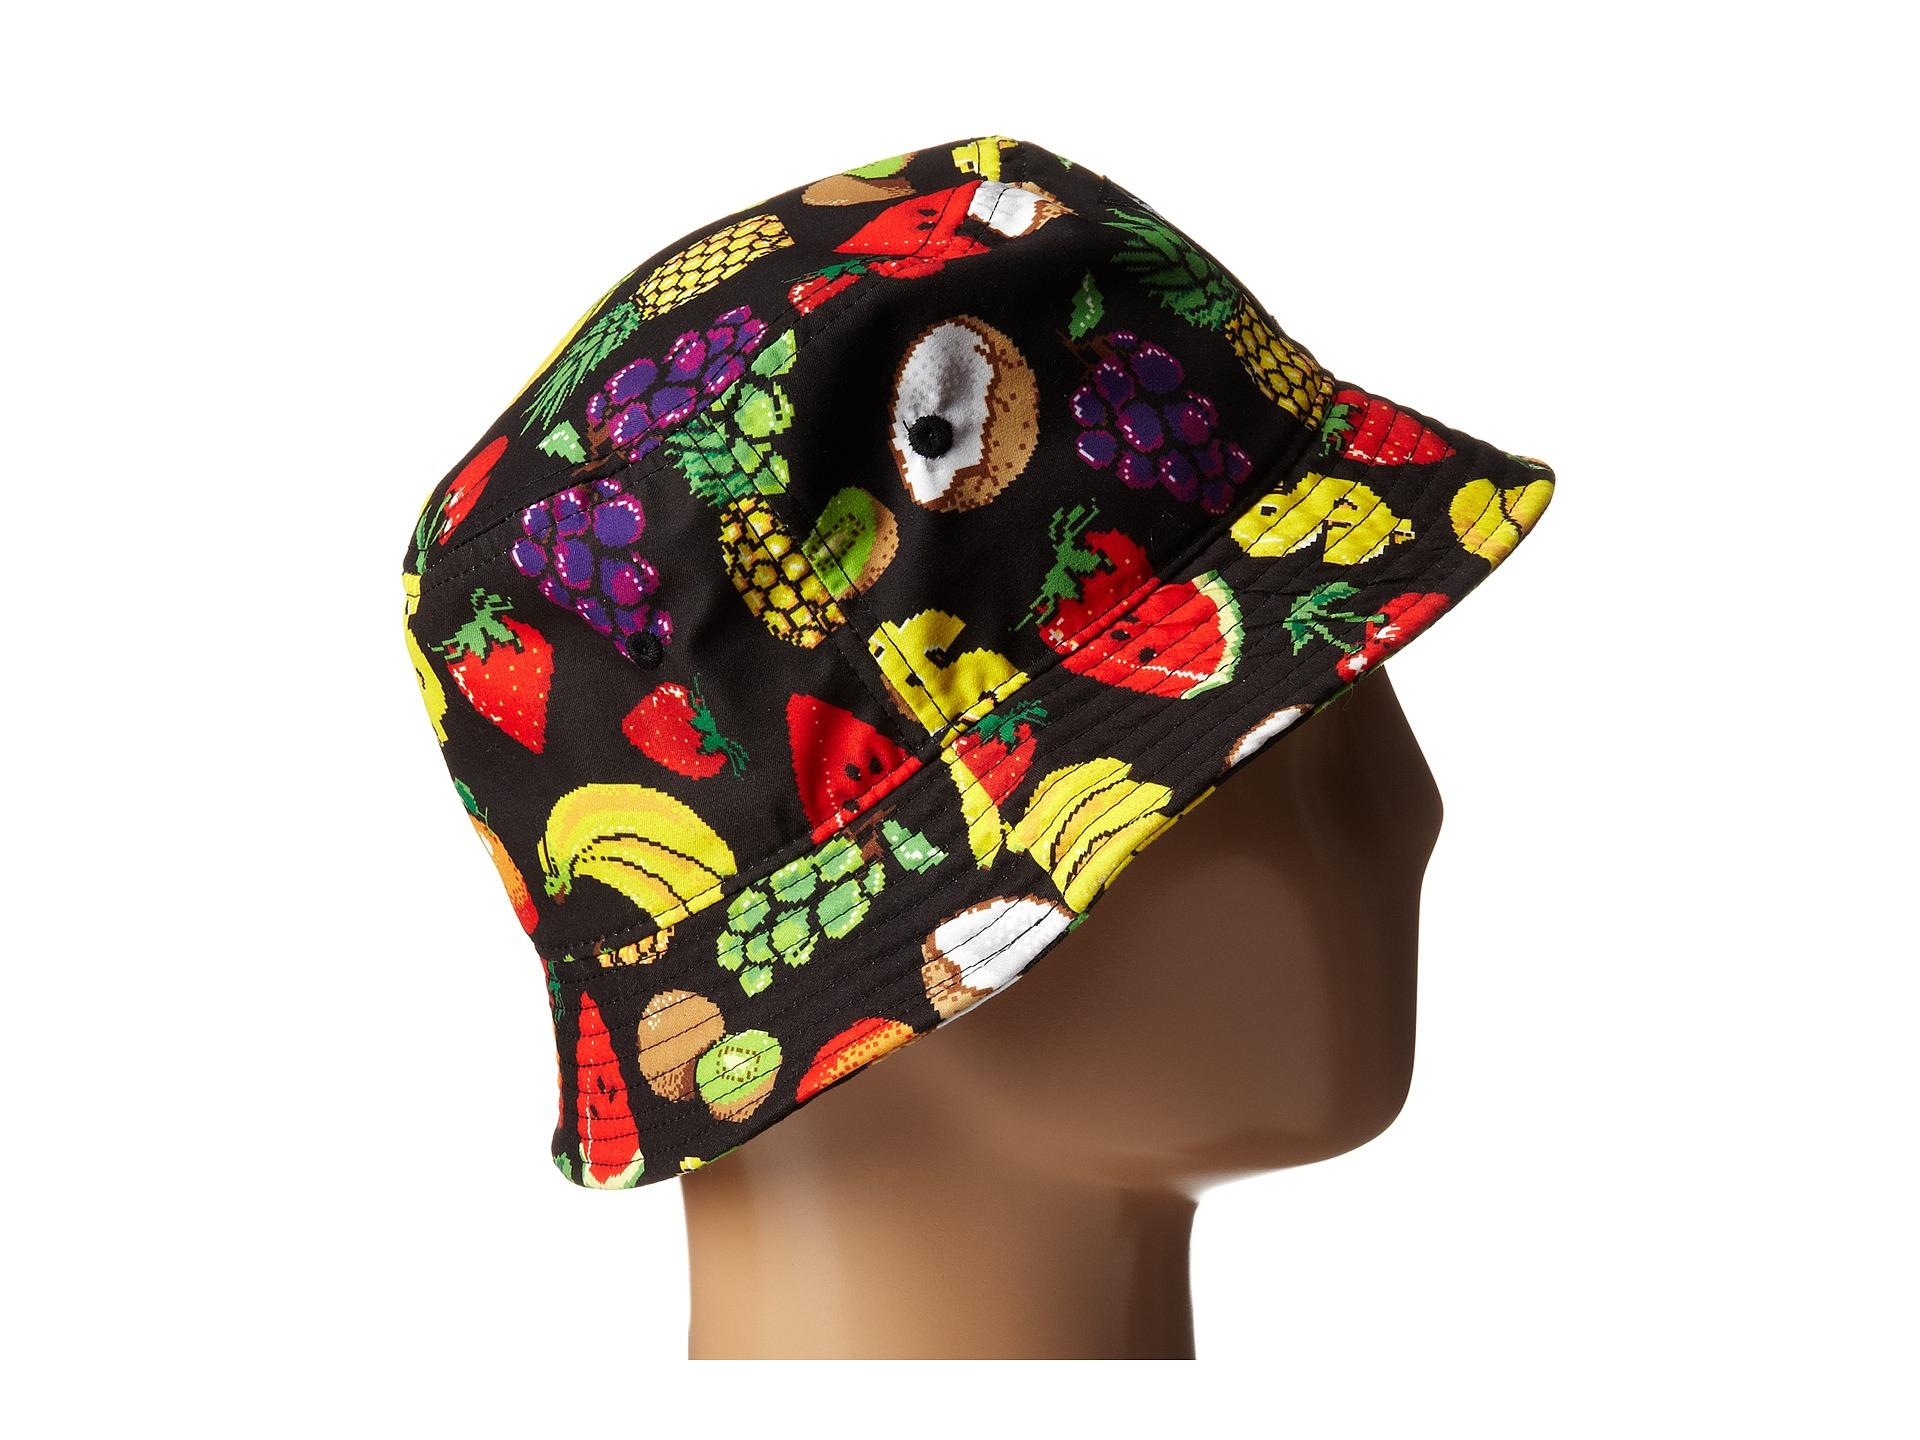 Lyst - Neff Hard Fruit Bucket Hat f88297f1aa5